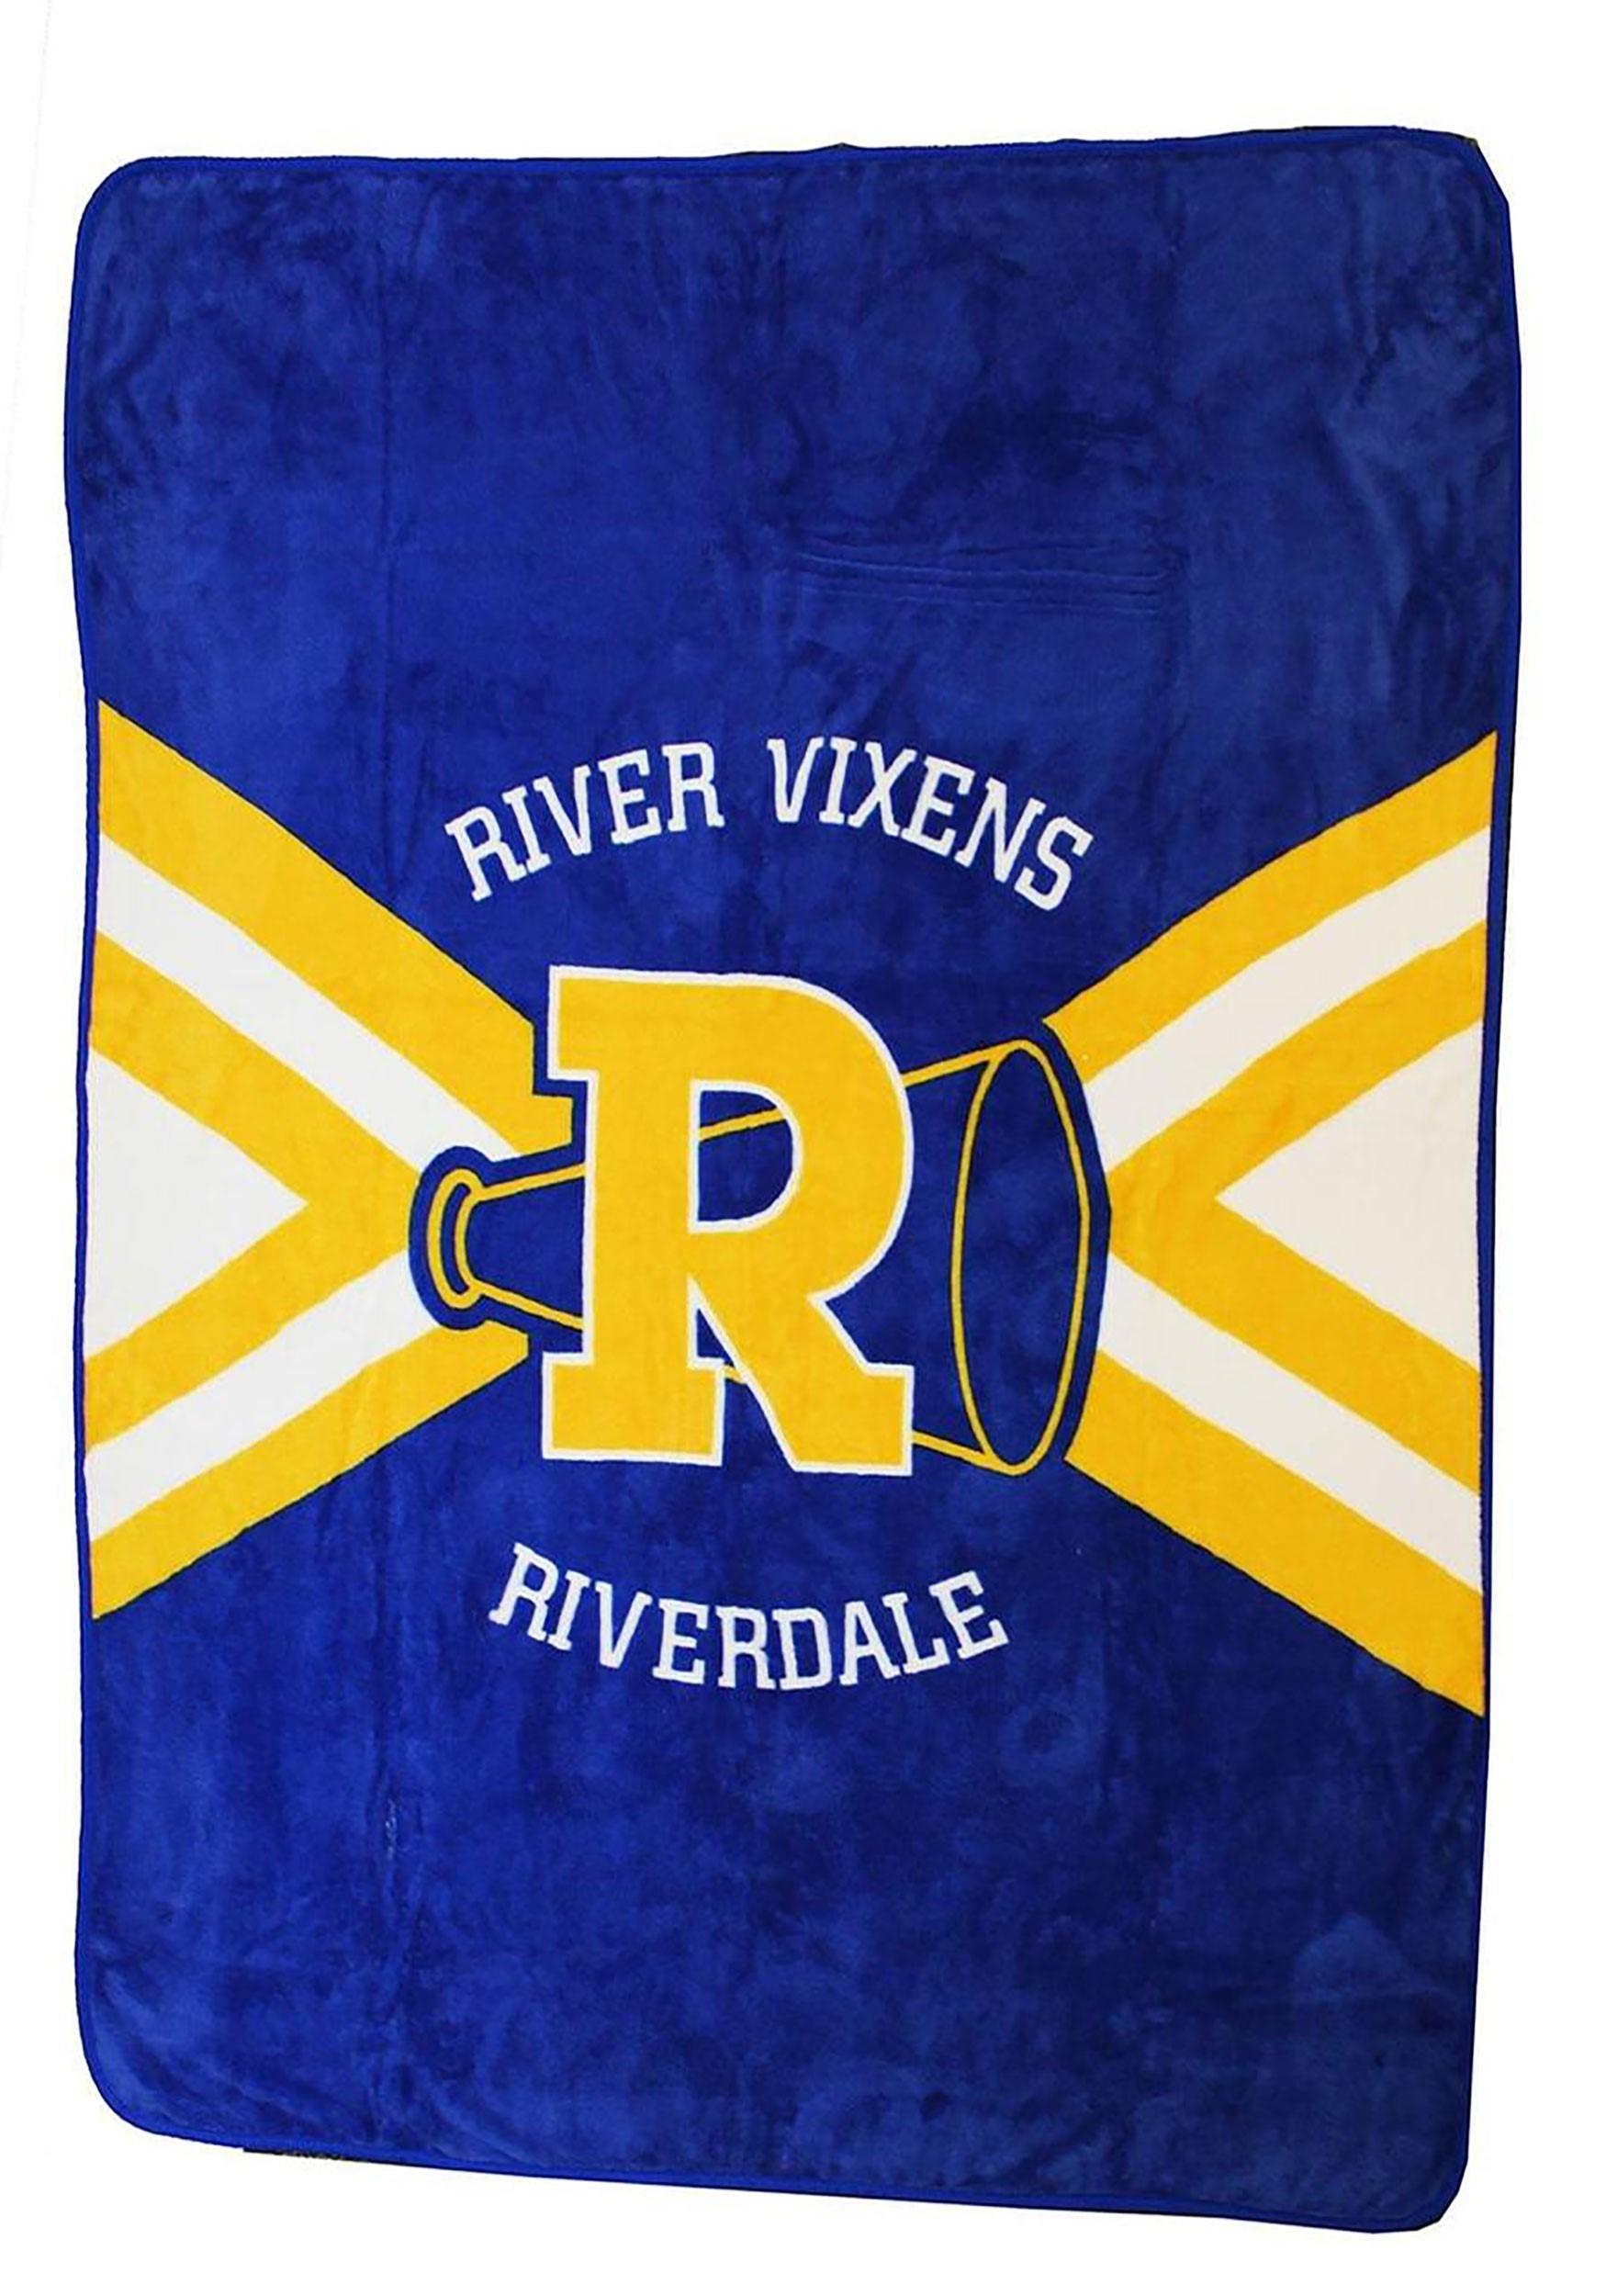 Fleece Riverdale Vixens Blanket